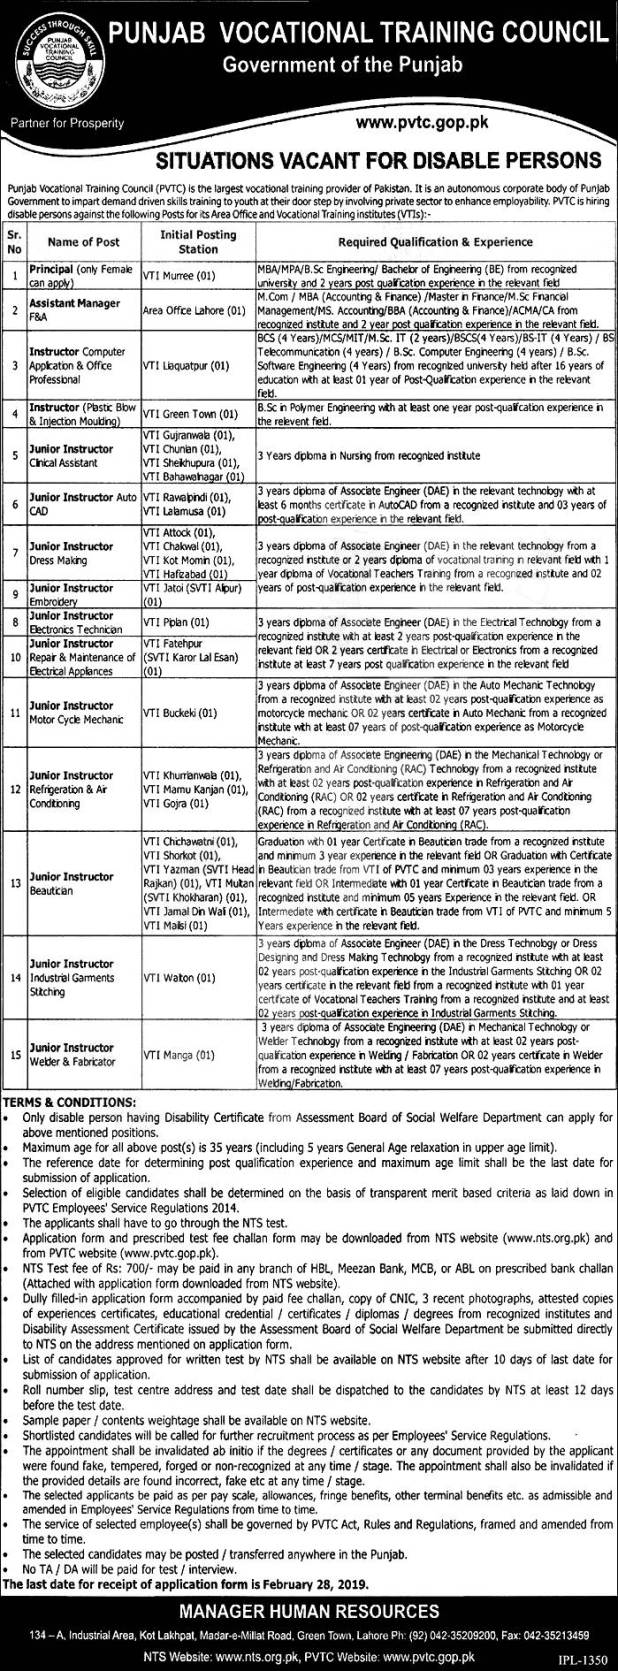 Punjab Vocational Training Council PVTC Jobs 2021 NTS Online Test Preparation MCQs